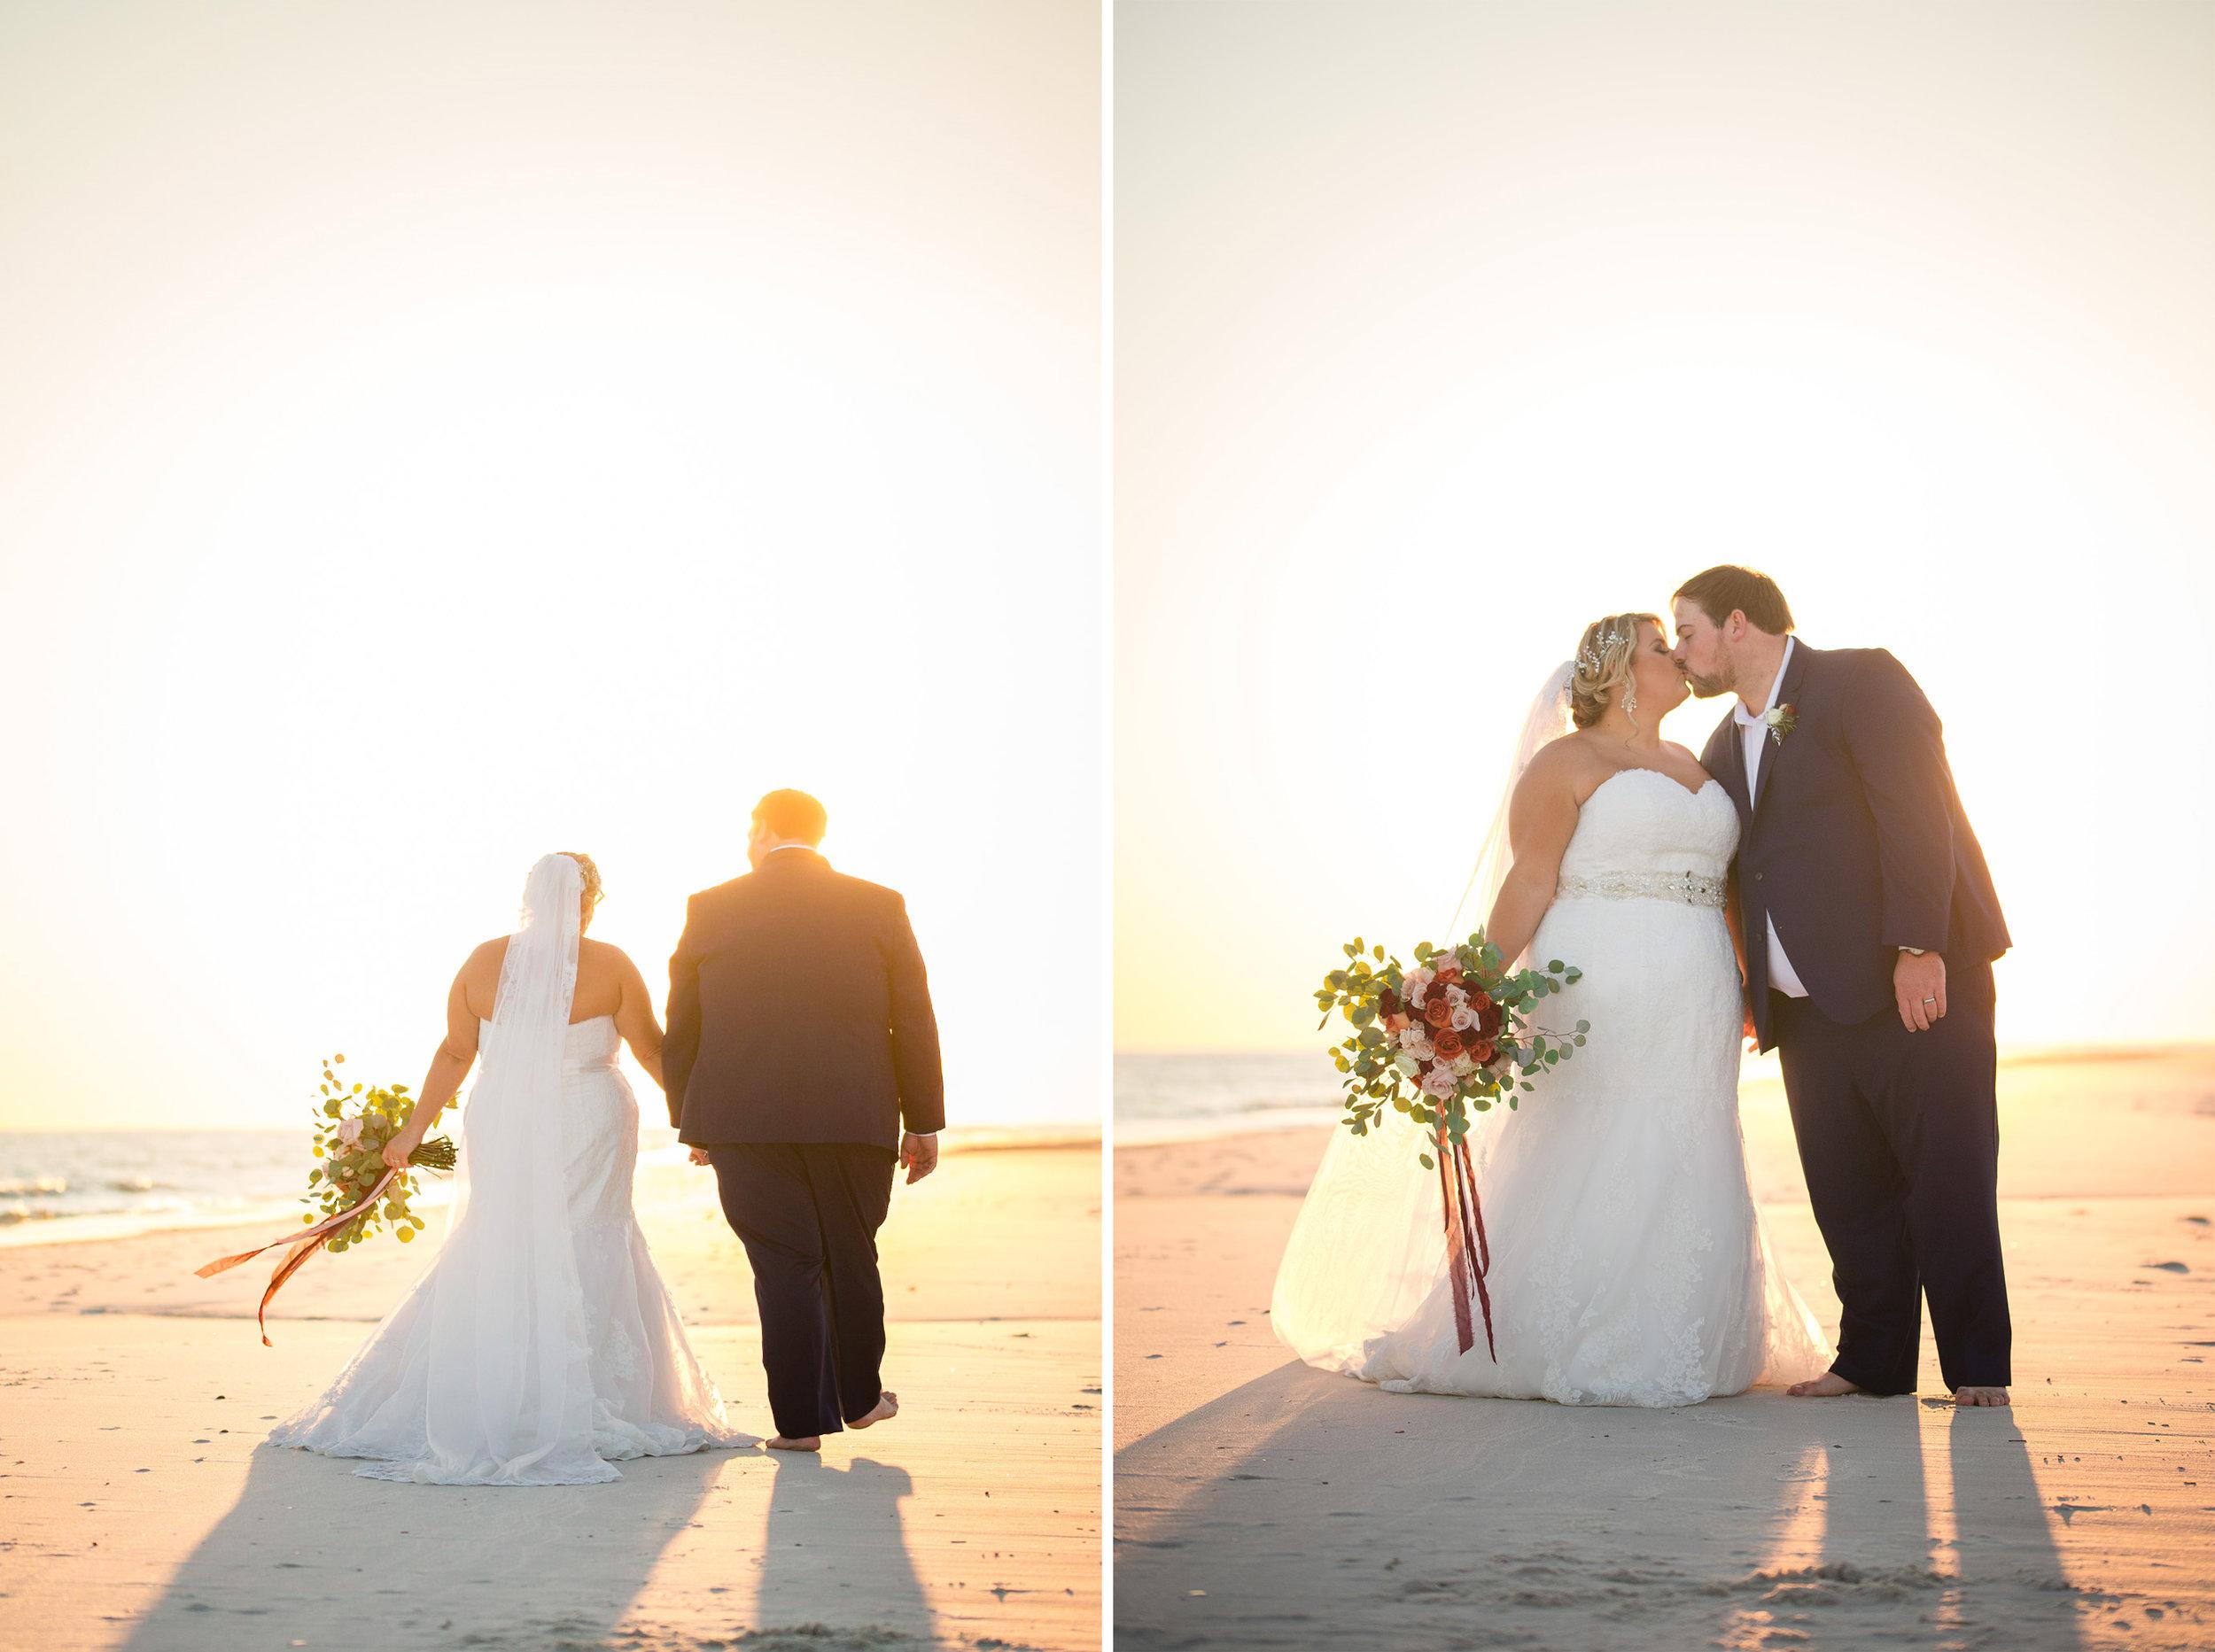 Gulf-Shores-Alabama-Beach-House-Wedding-Photography-orange beach-fairhope-mobile-pensacola-navarre-destin-photo-photographer-wedding video-videography.jpg